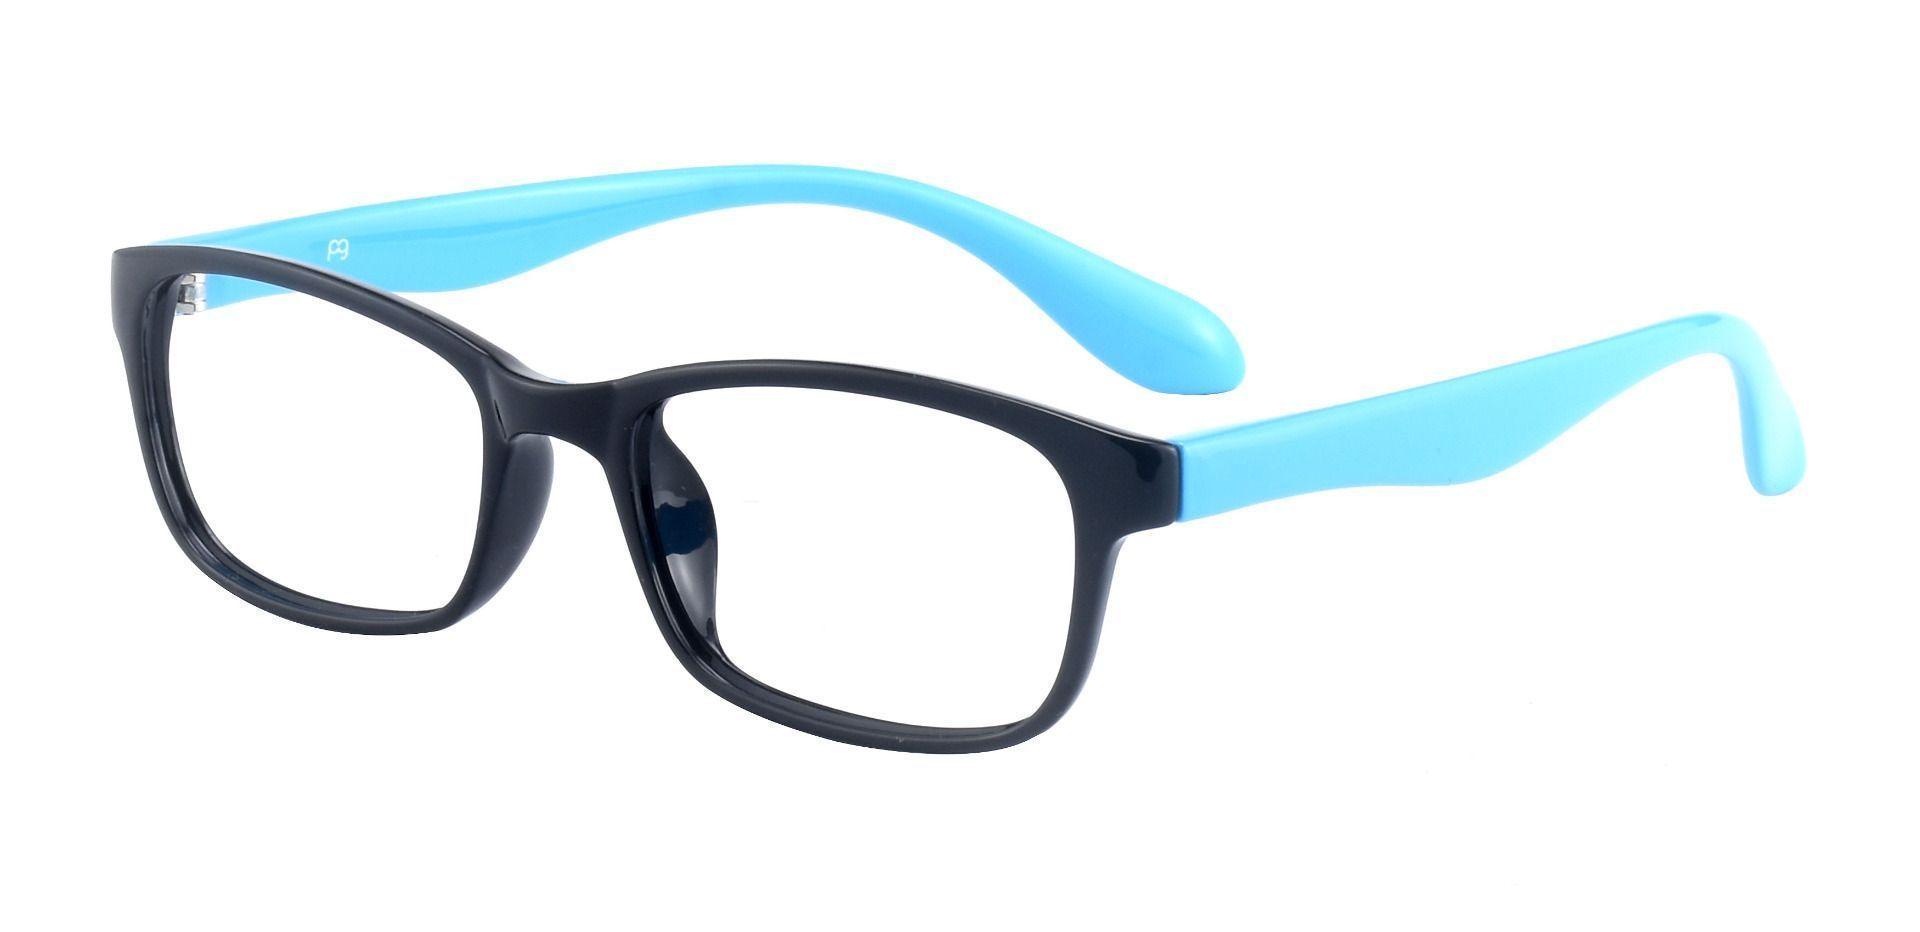 Amos Rectangle Prescription Glasses - Black